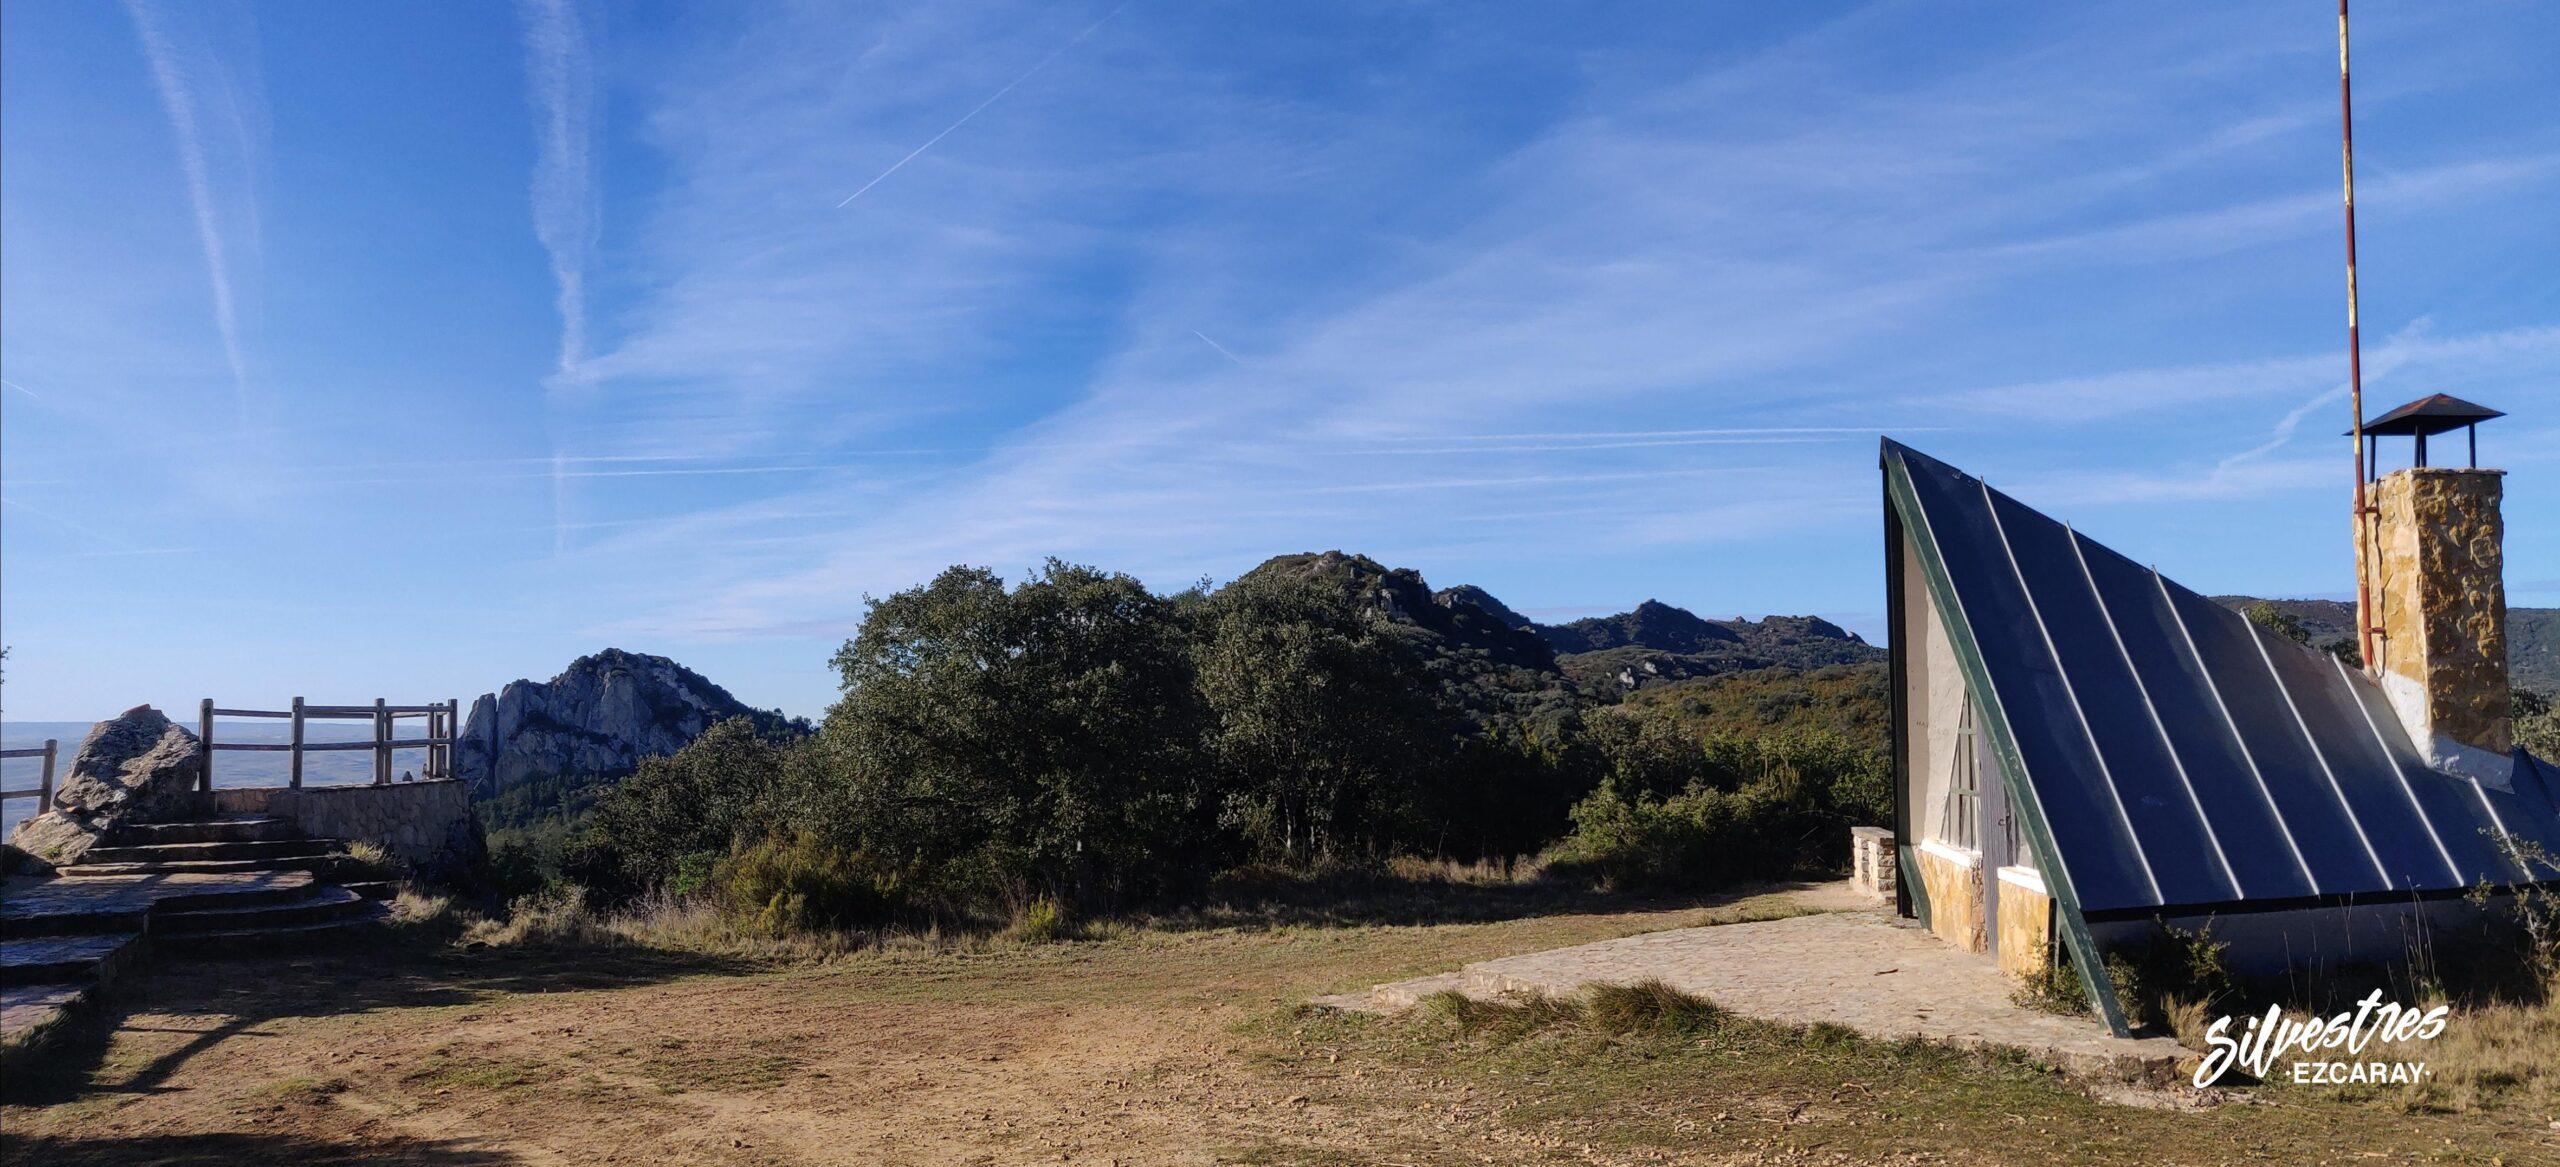 mirador_la_rioja_refugio_montes_obarenes_panoramicas_guia_montaña_naturaleza_paisaje